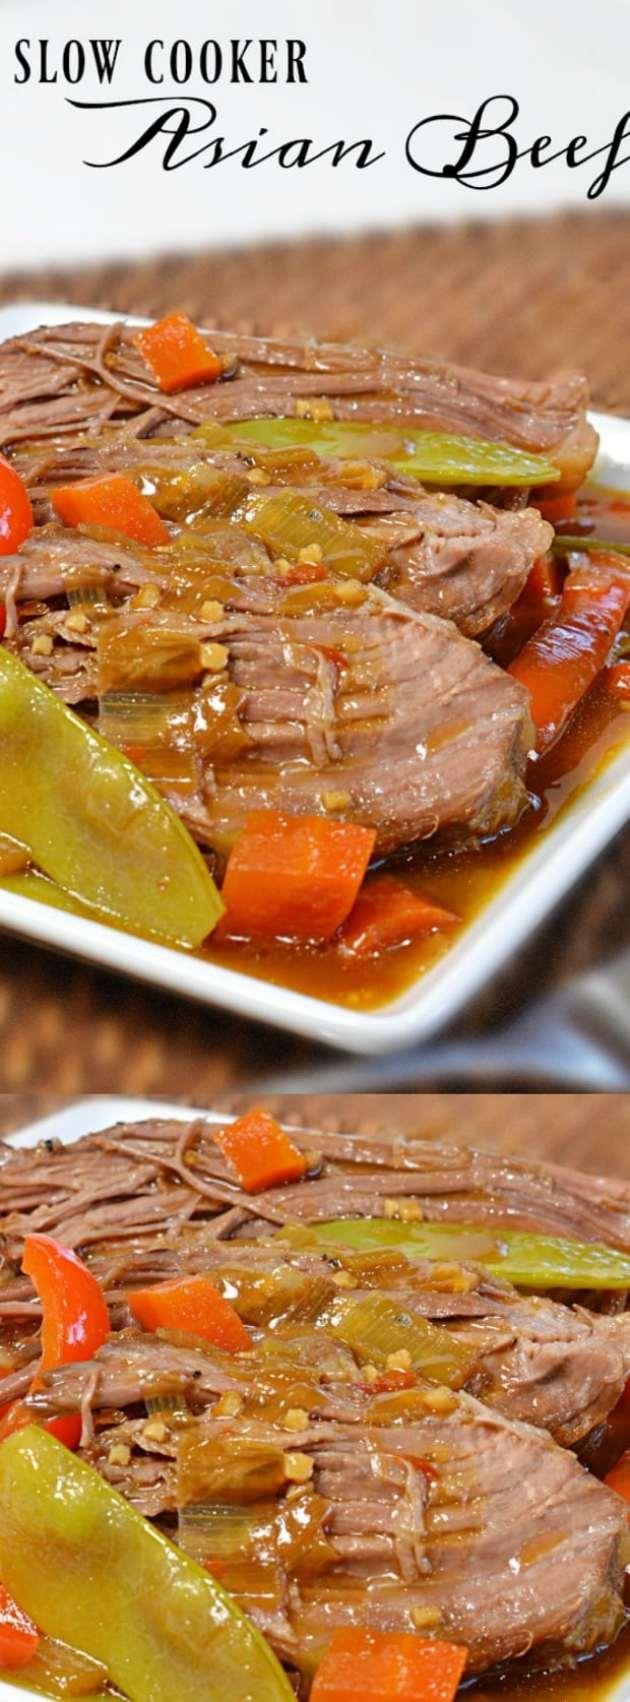 Slow Cooker Asian Beef Longpin